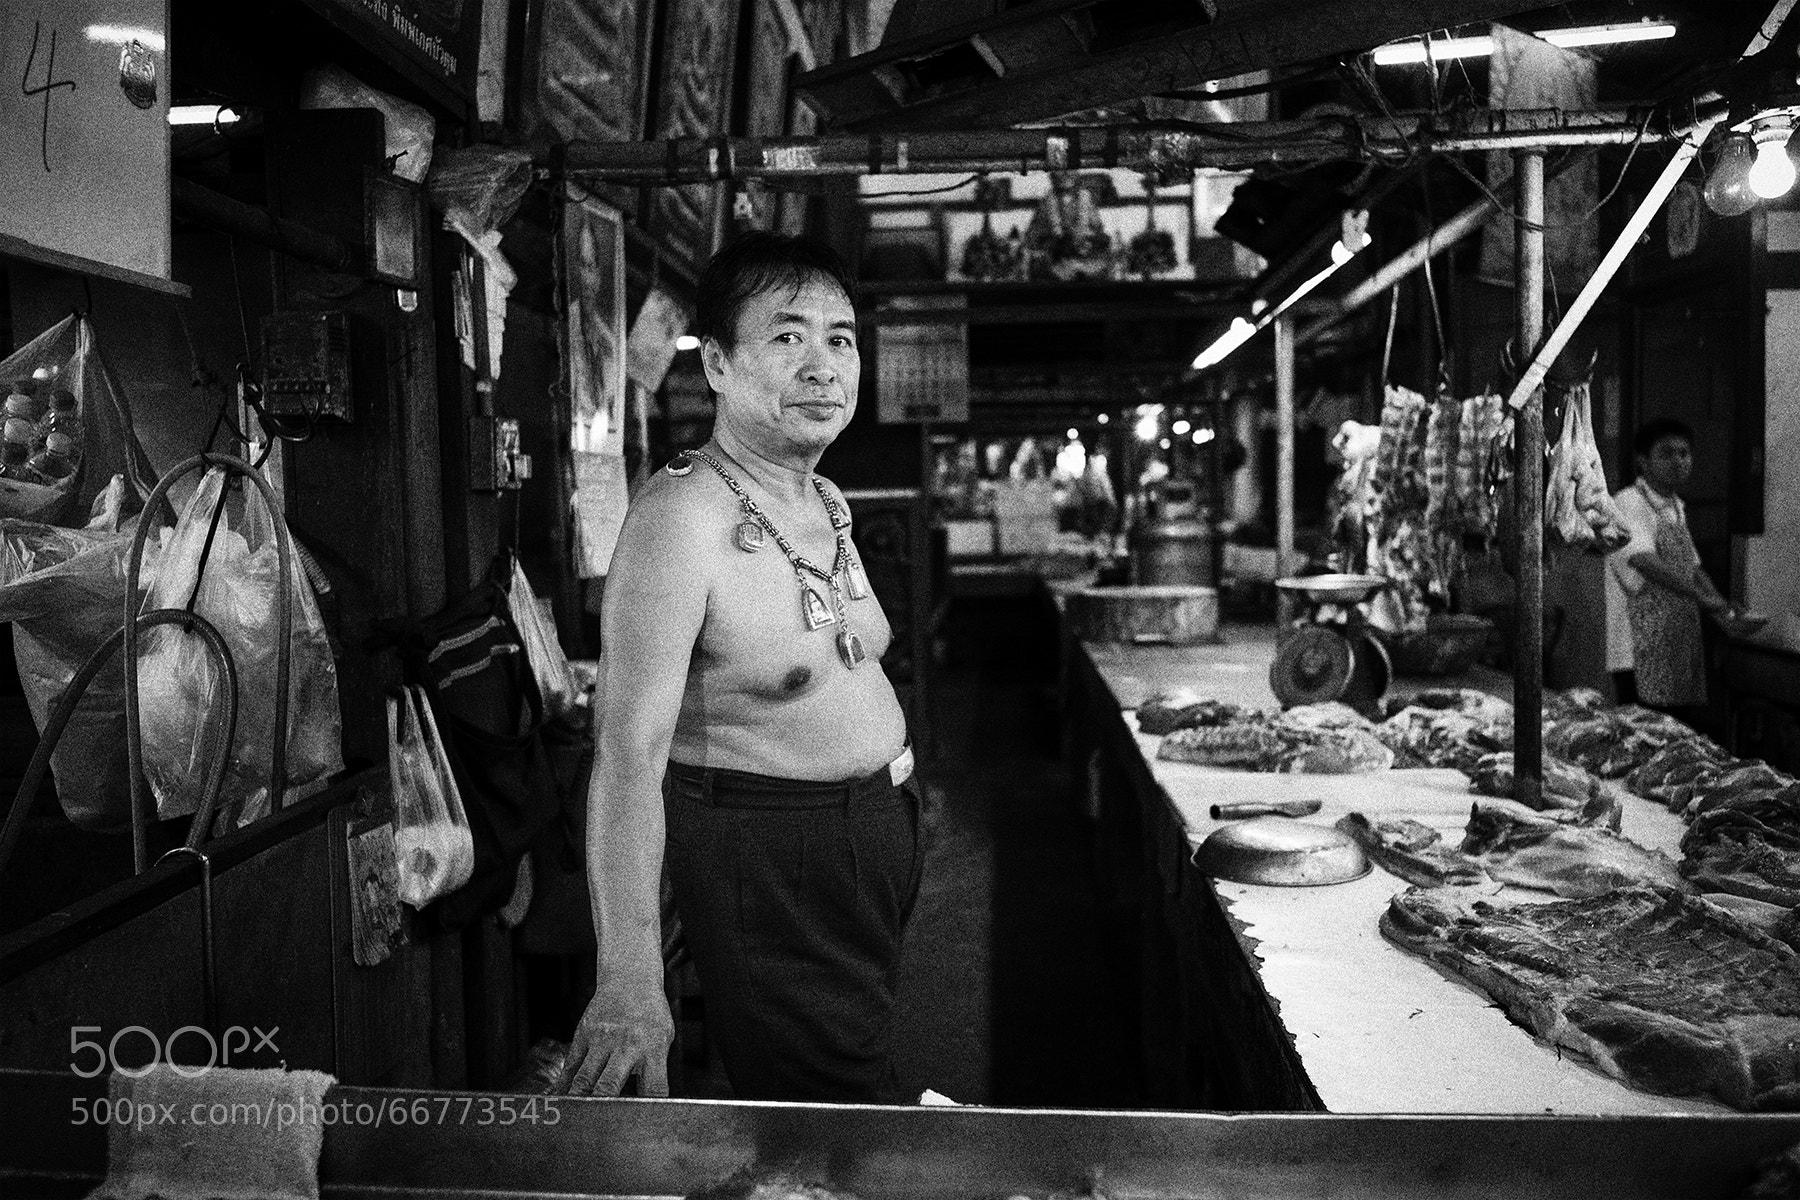 Photograph klong toey market, 2014 by  momofuku on 500px